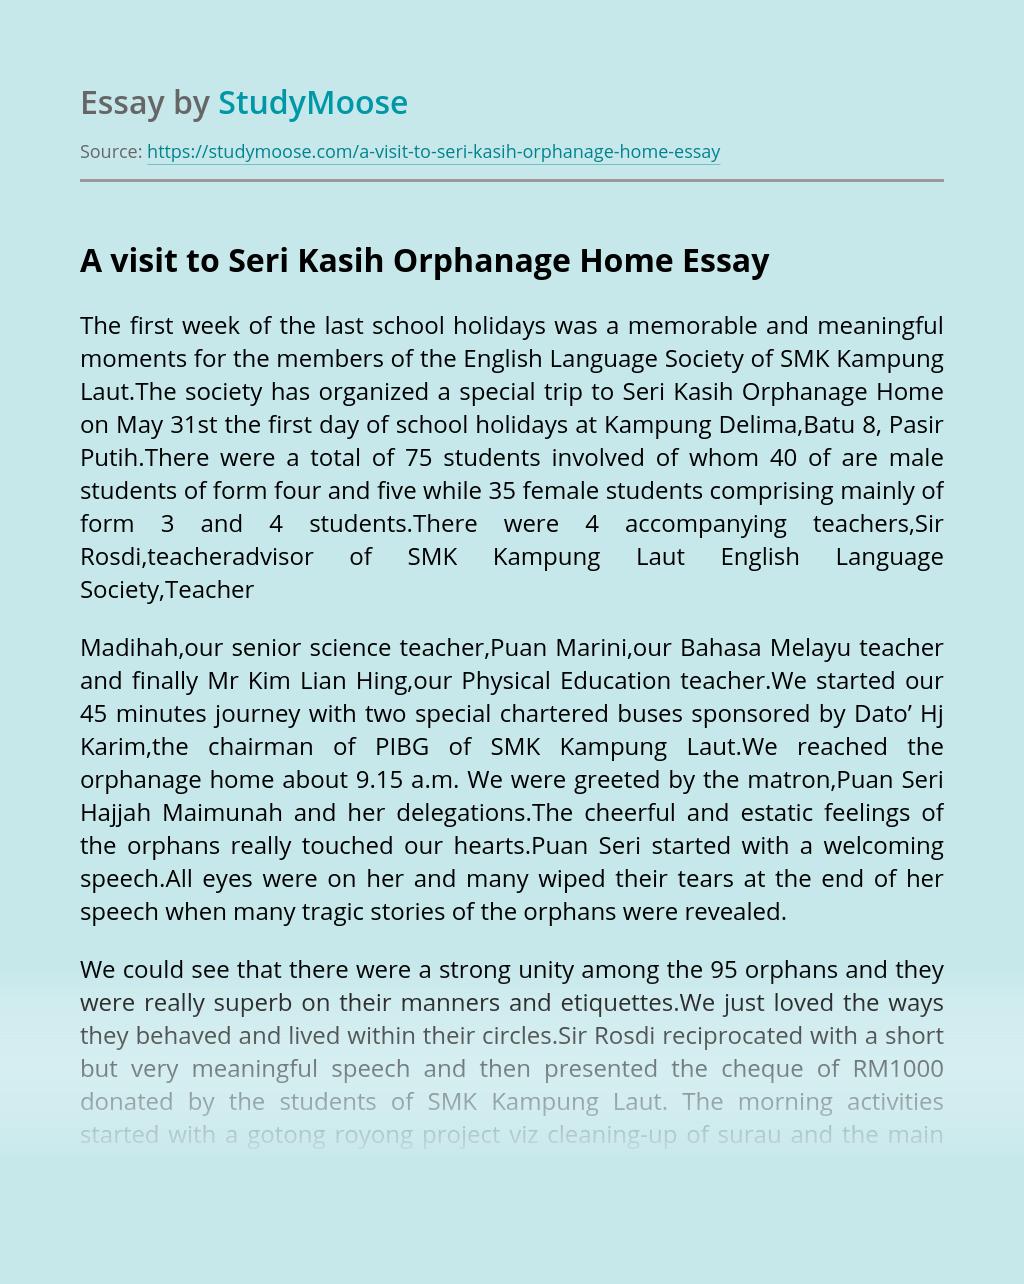 A visit to Seri Kasih Orphanage Home